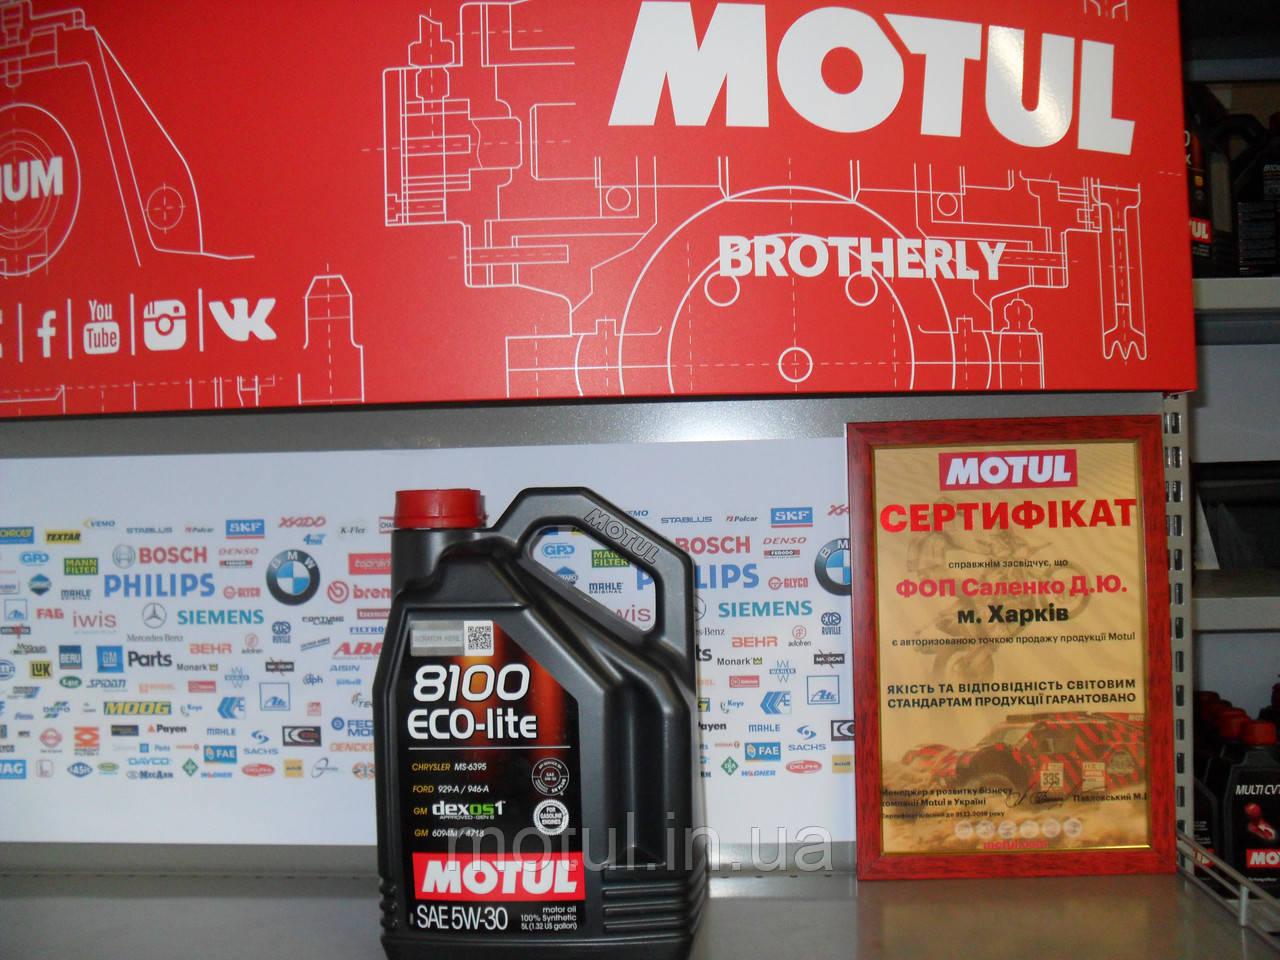 Моторное масло Motul 8100 eco-lite 5w30 5л